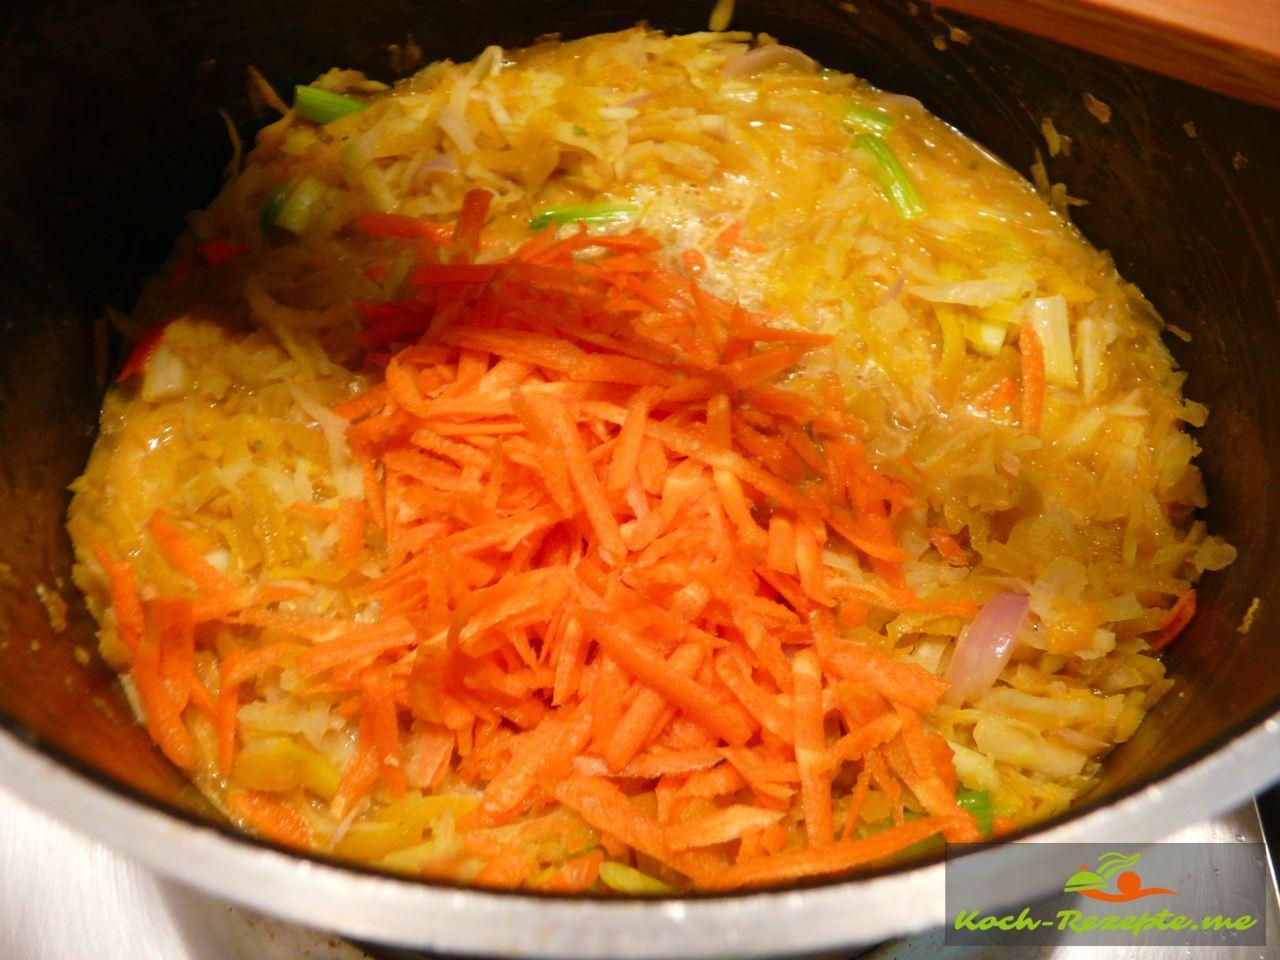 Thai Rezept Gemüse Nudeln Garnelen,Möhren dazu noch 3 Mintuen köcheln